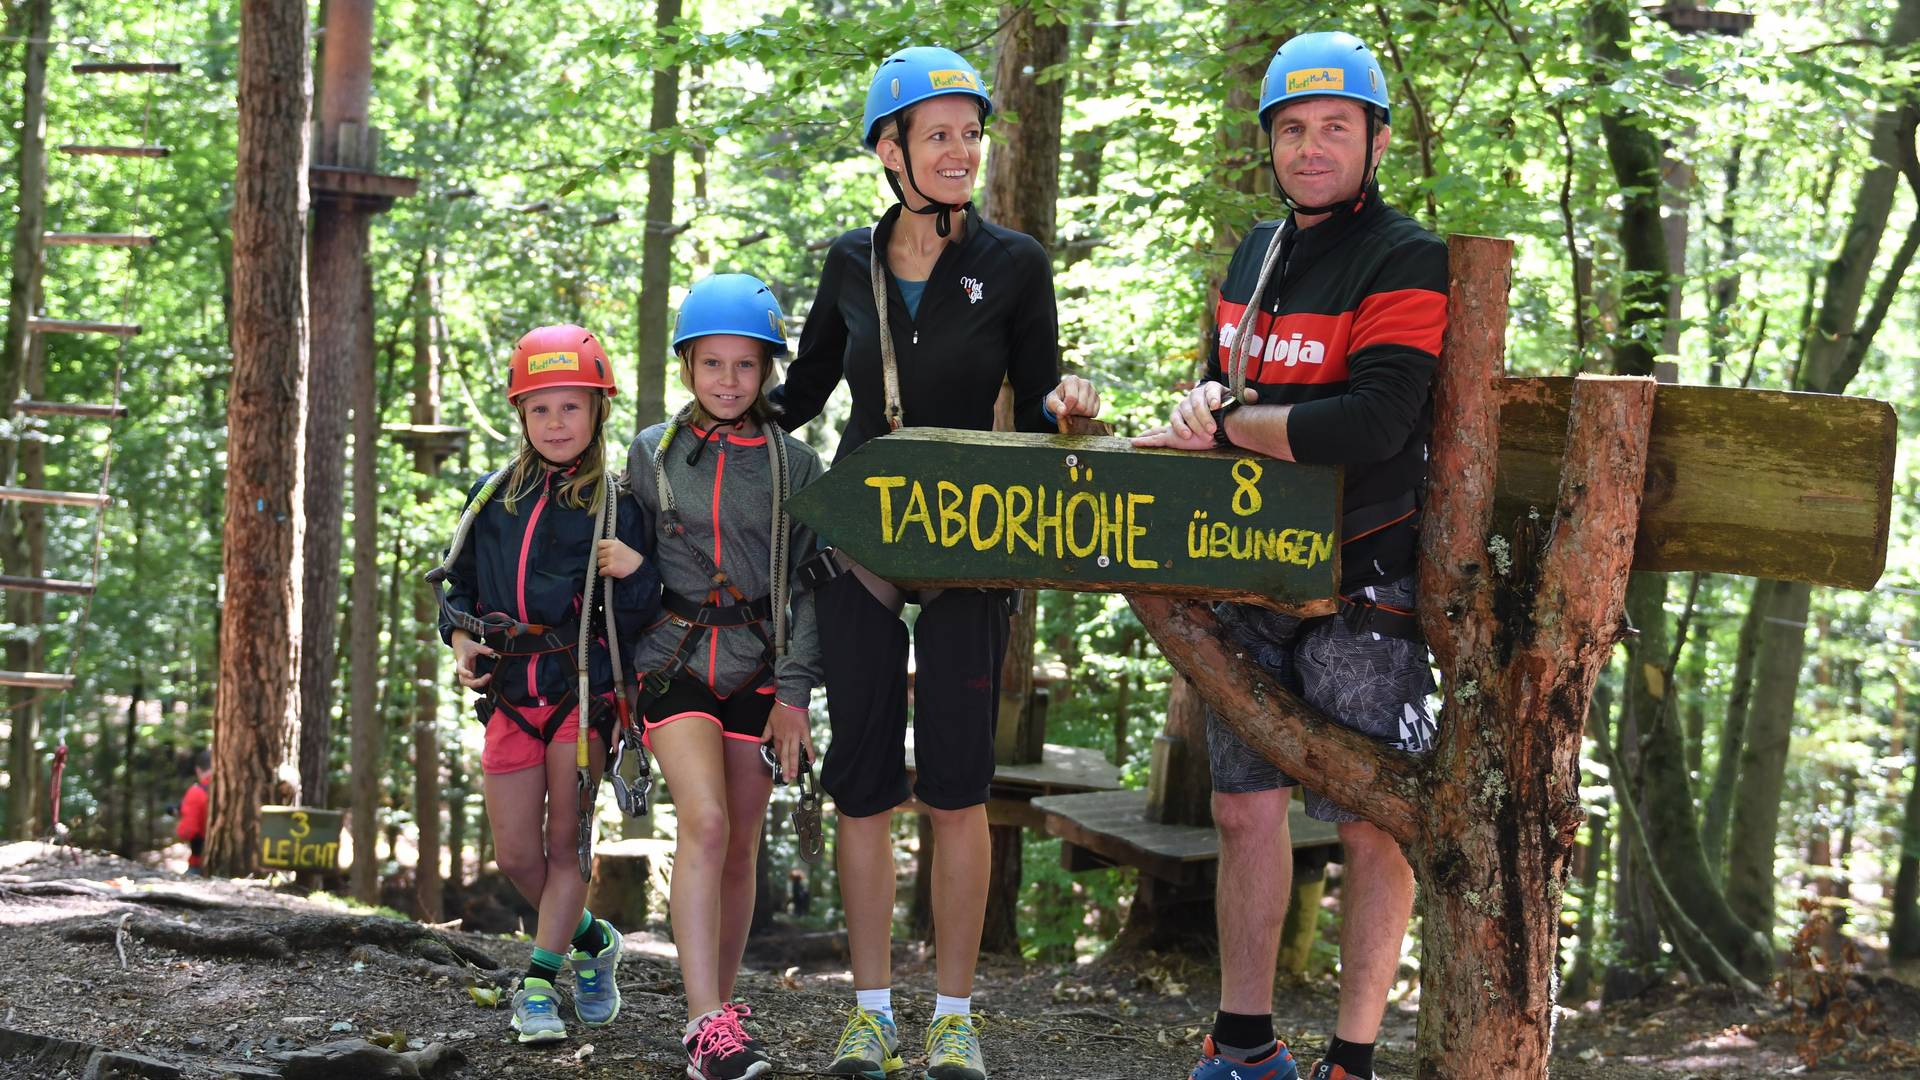 Waldseilpark Taborhoehe mit 9 Parcours